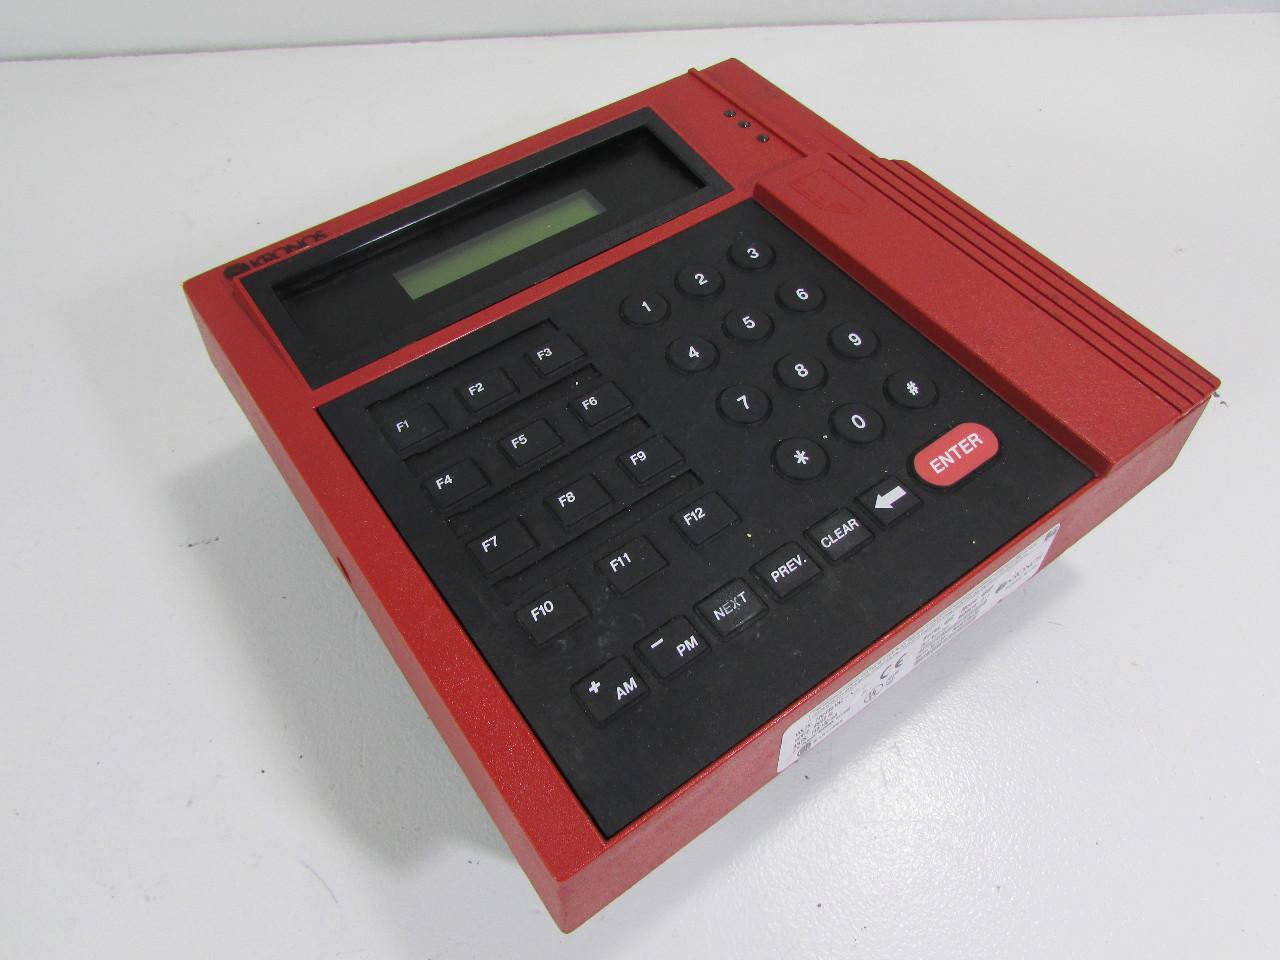 Kronos 480f Time Clock For Sale: KRONOS DIGITAL TIME CLOCK 480F